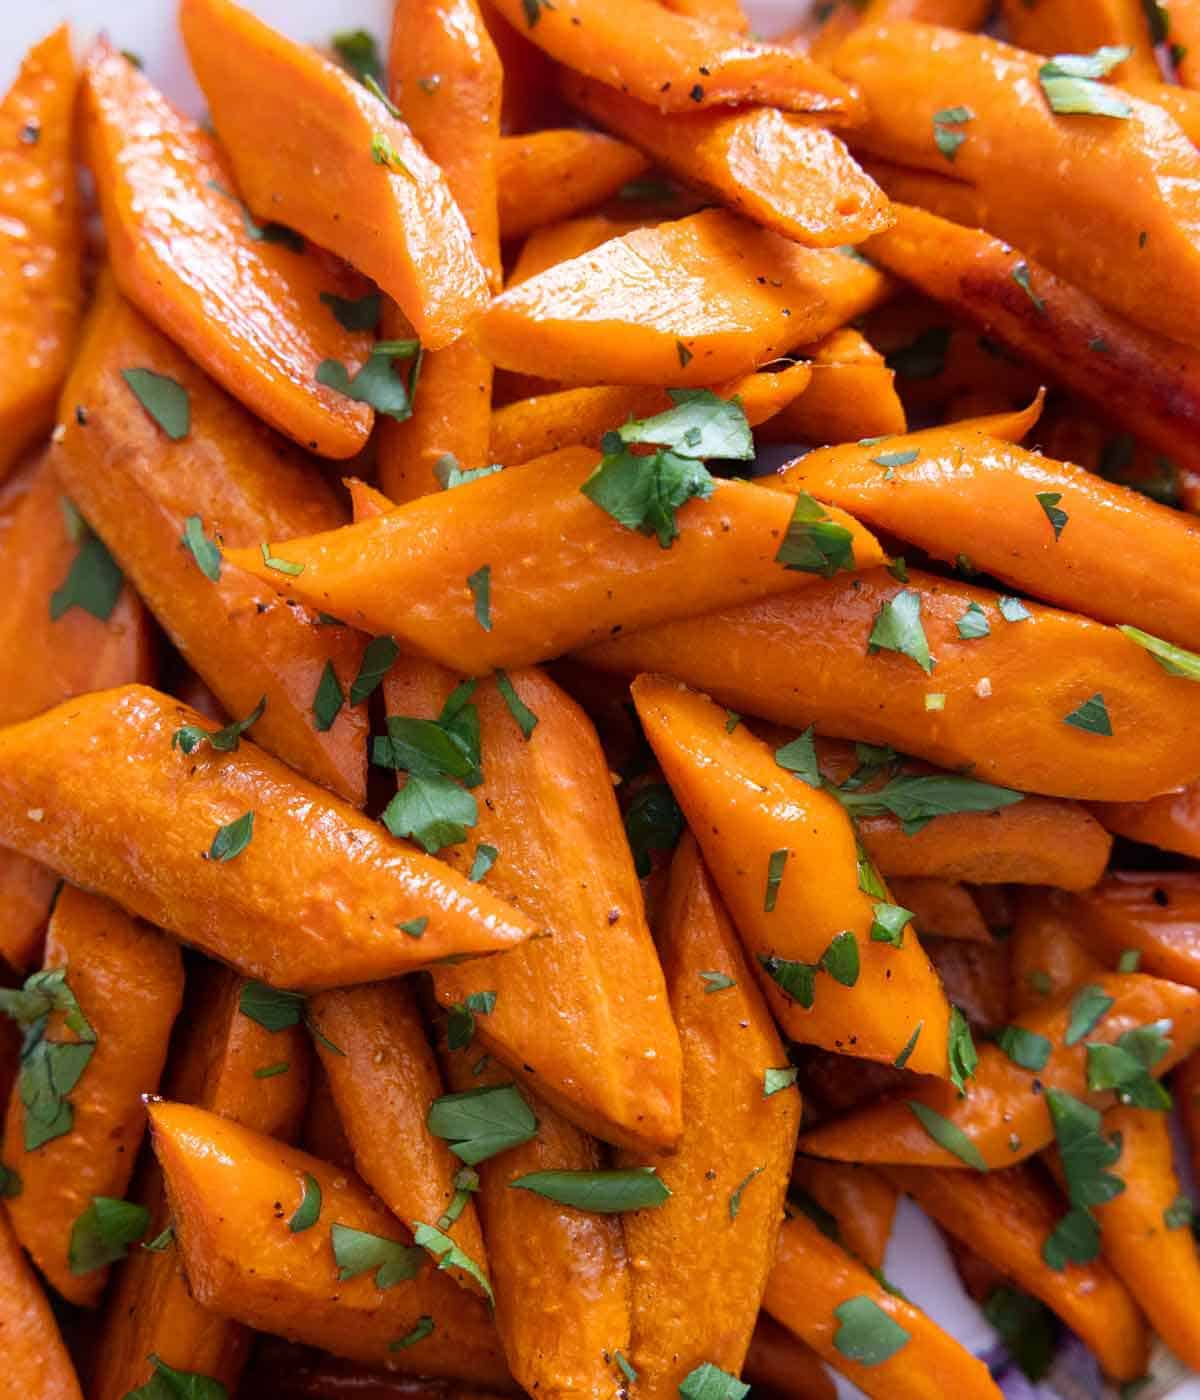 Close up of diagonally cut carrots, roasted.